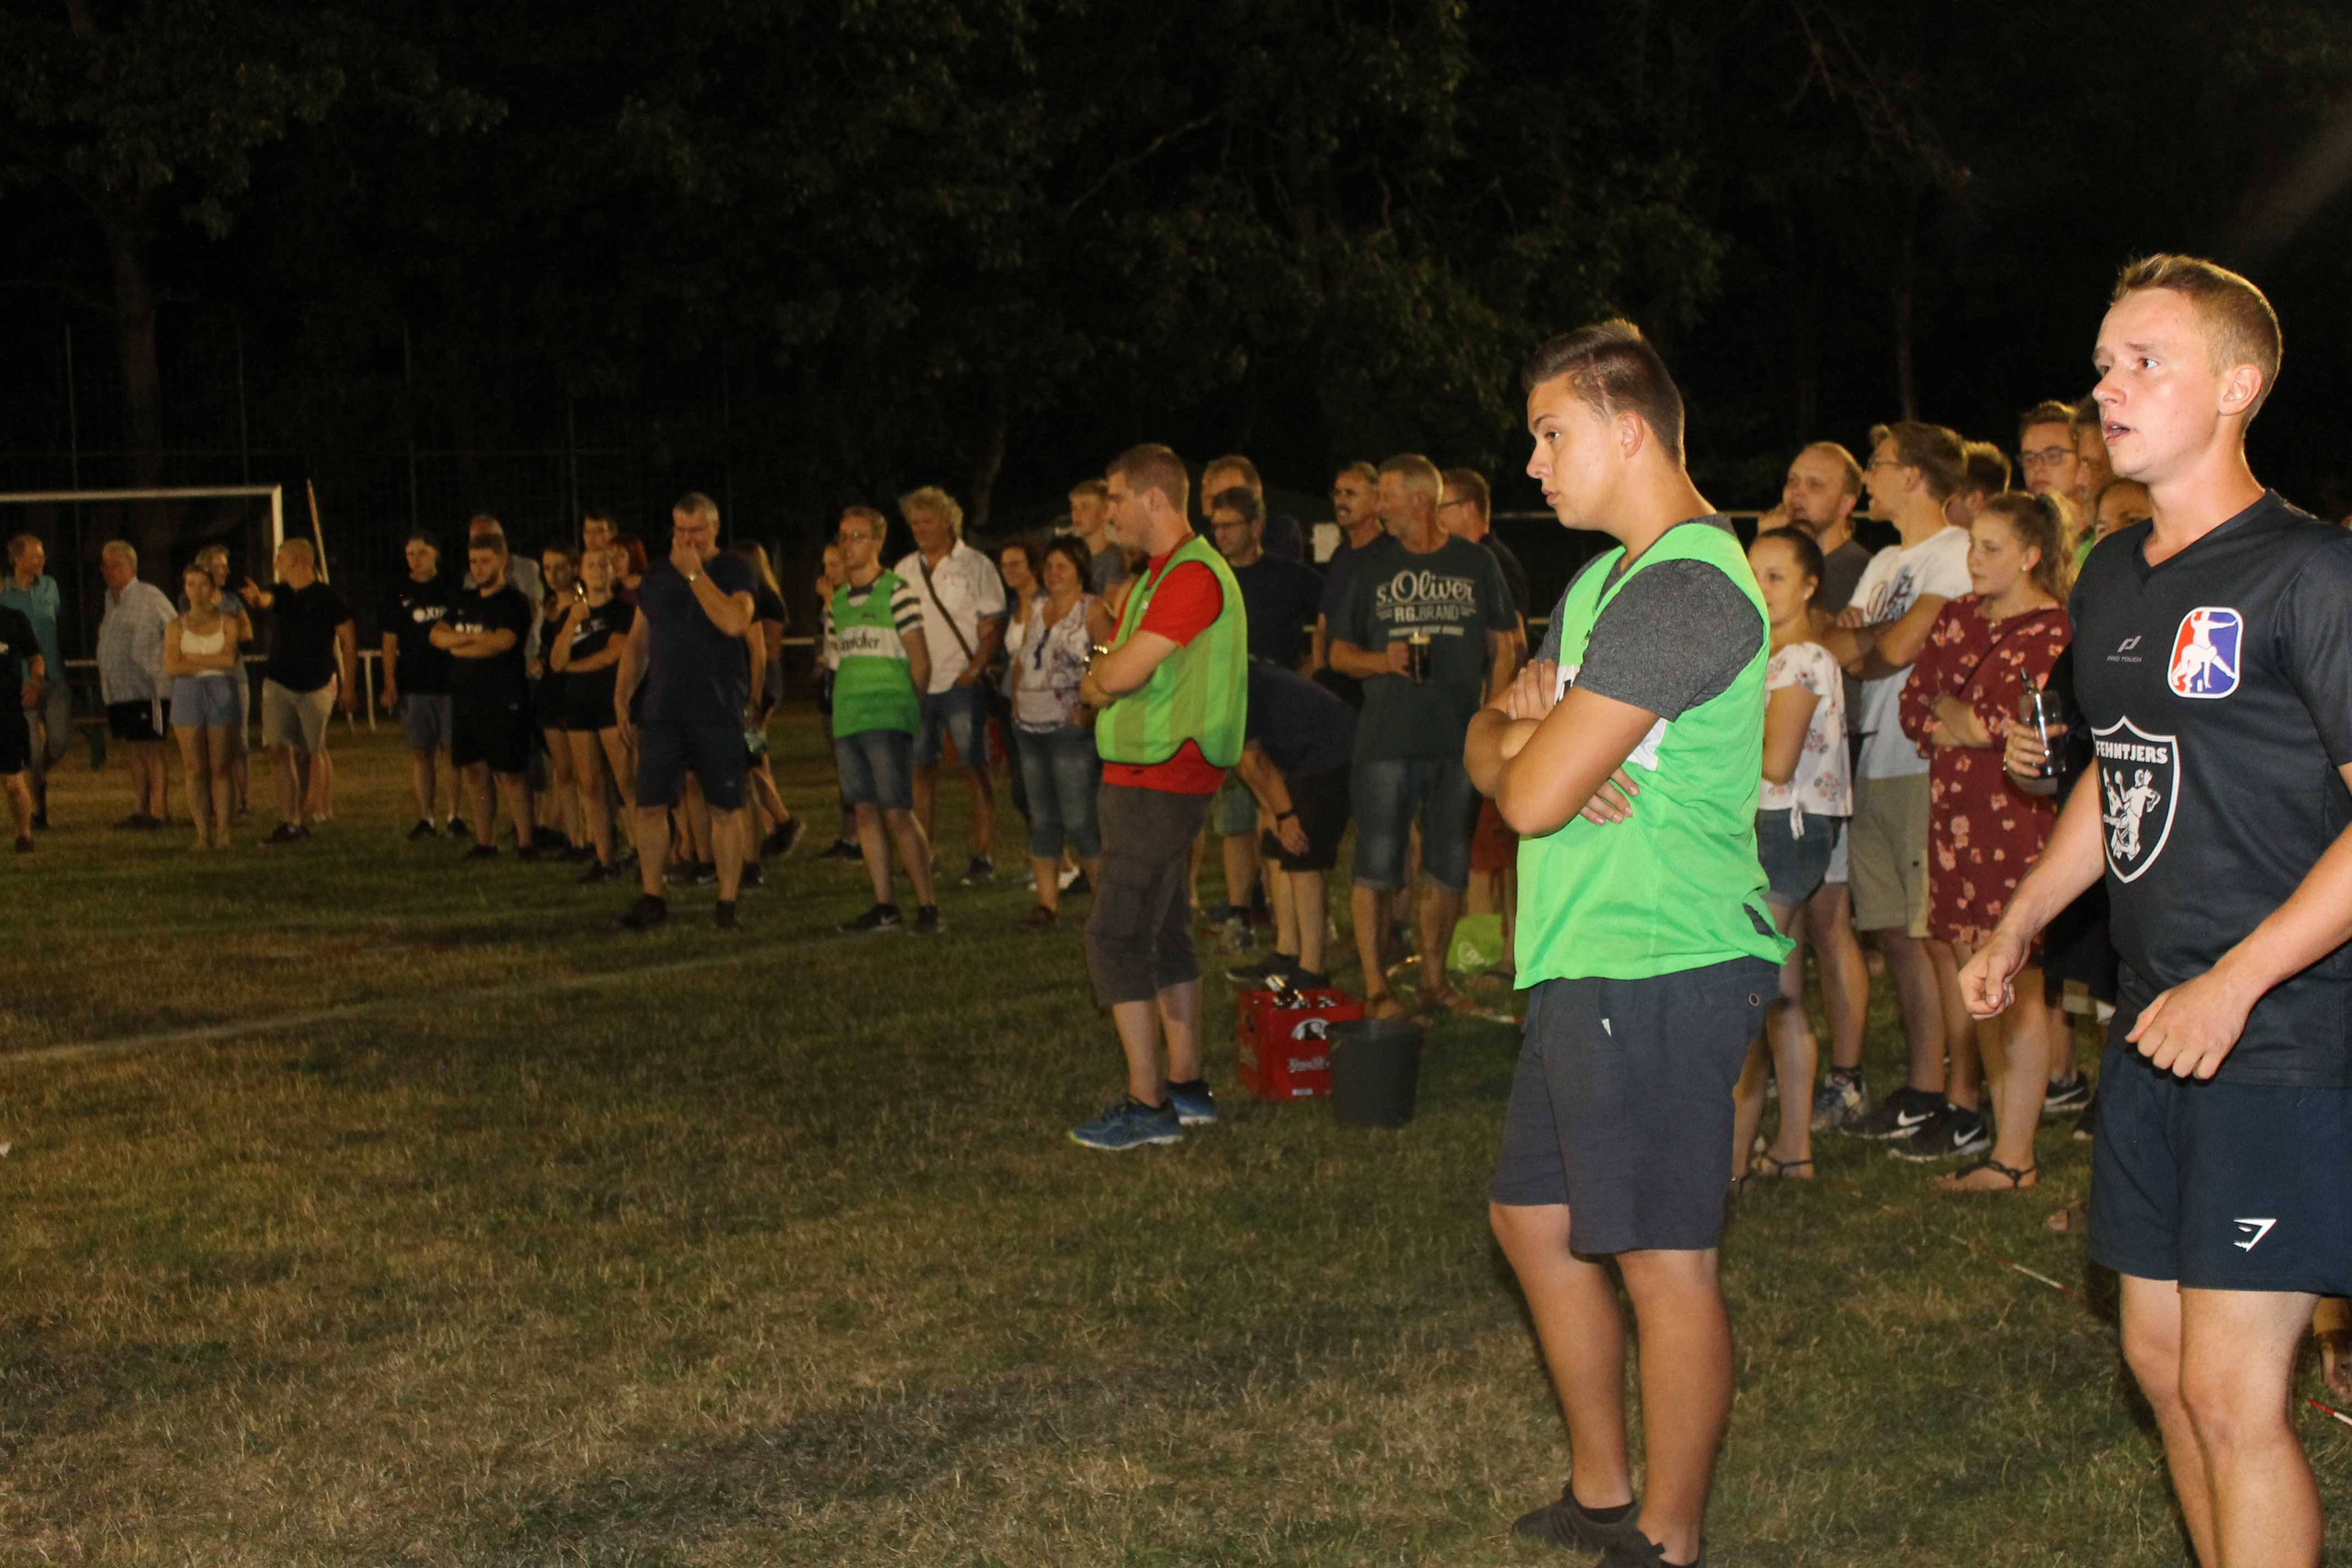 2018-07-27 Sportwoche - Flunkyball Turnier (77)